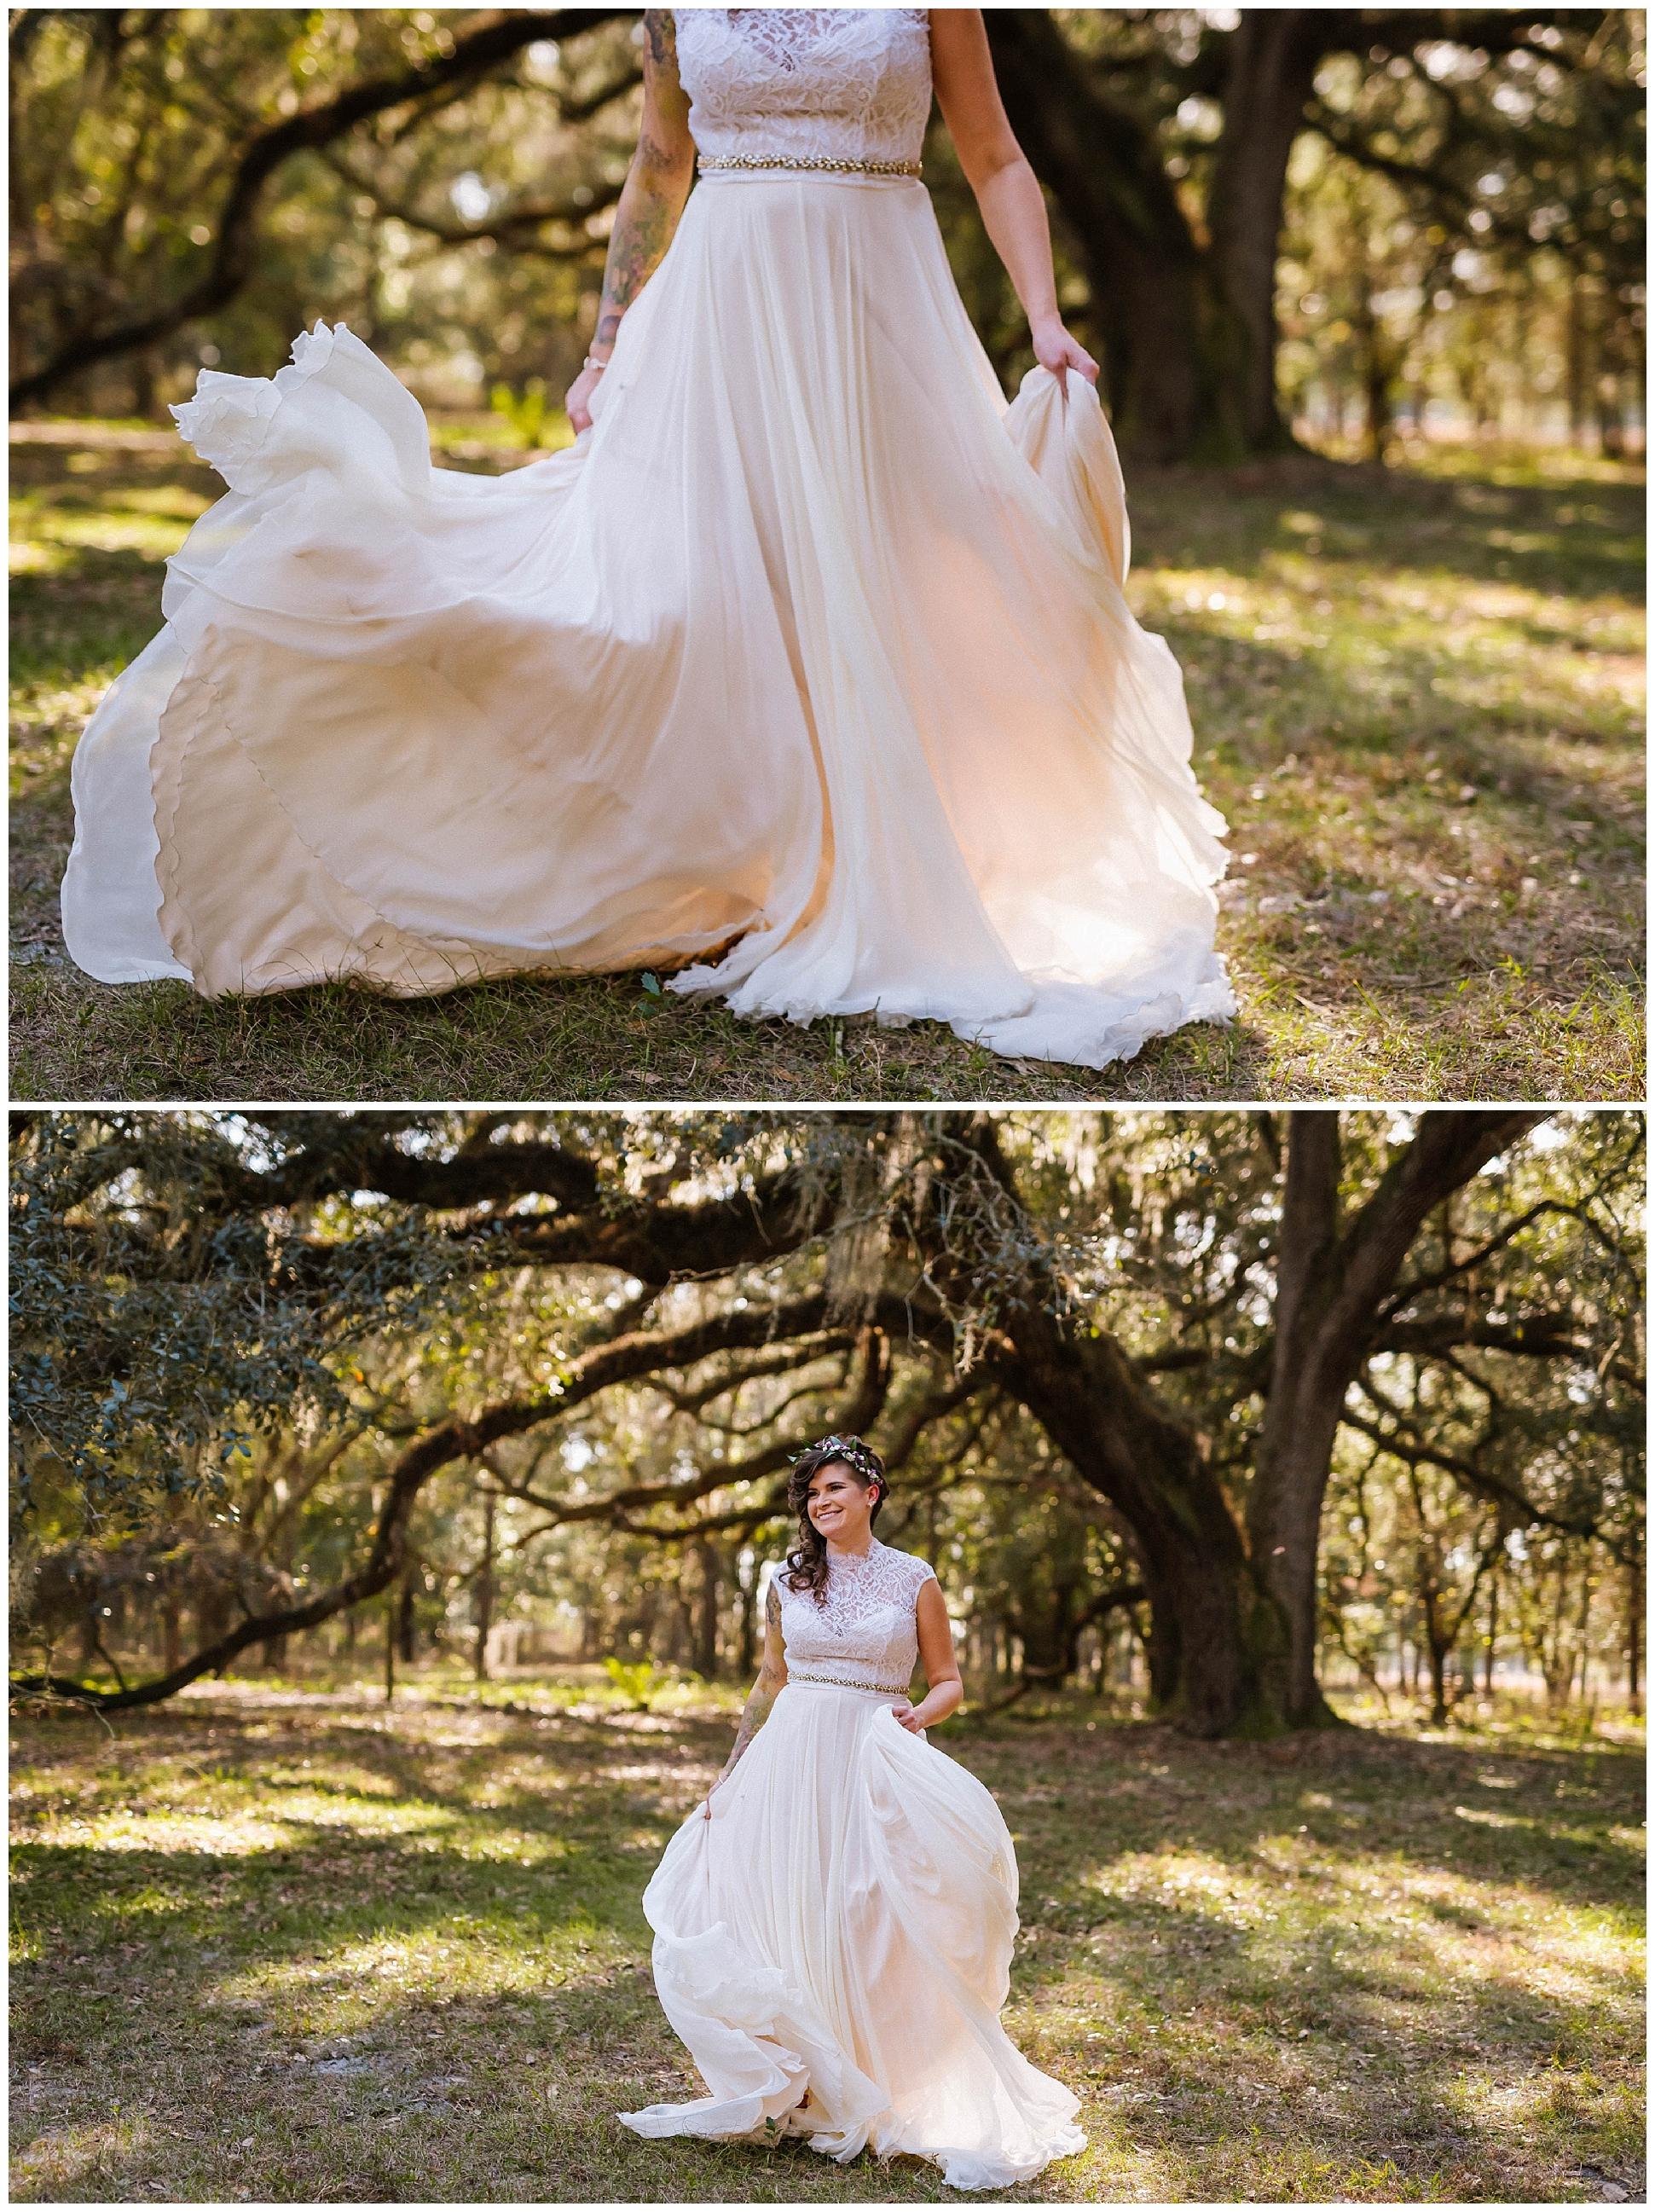 magical-outdoor-florida-wedding-smoke-bombs-flowers-crown-beard_0021.jpg